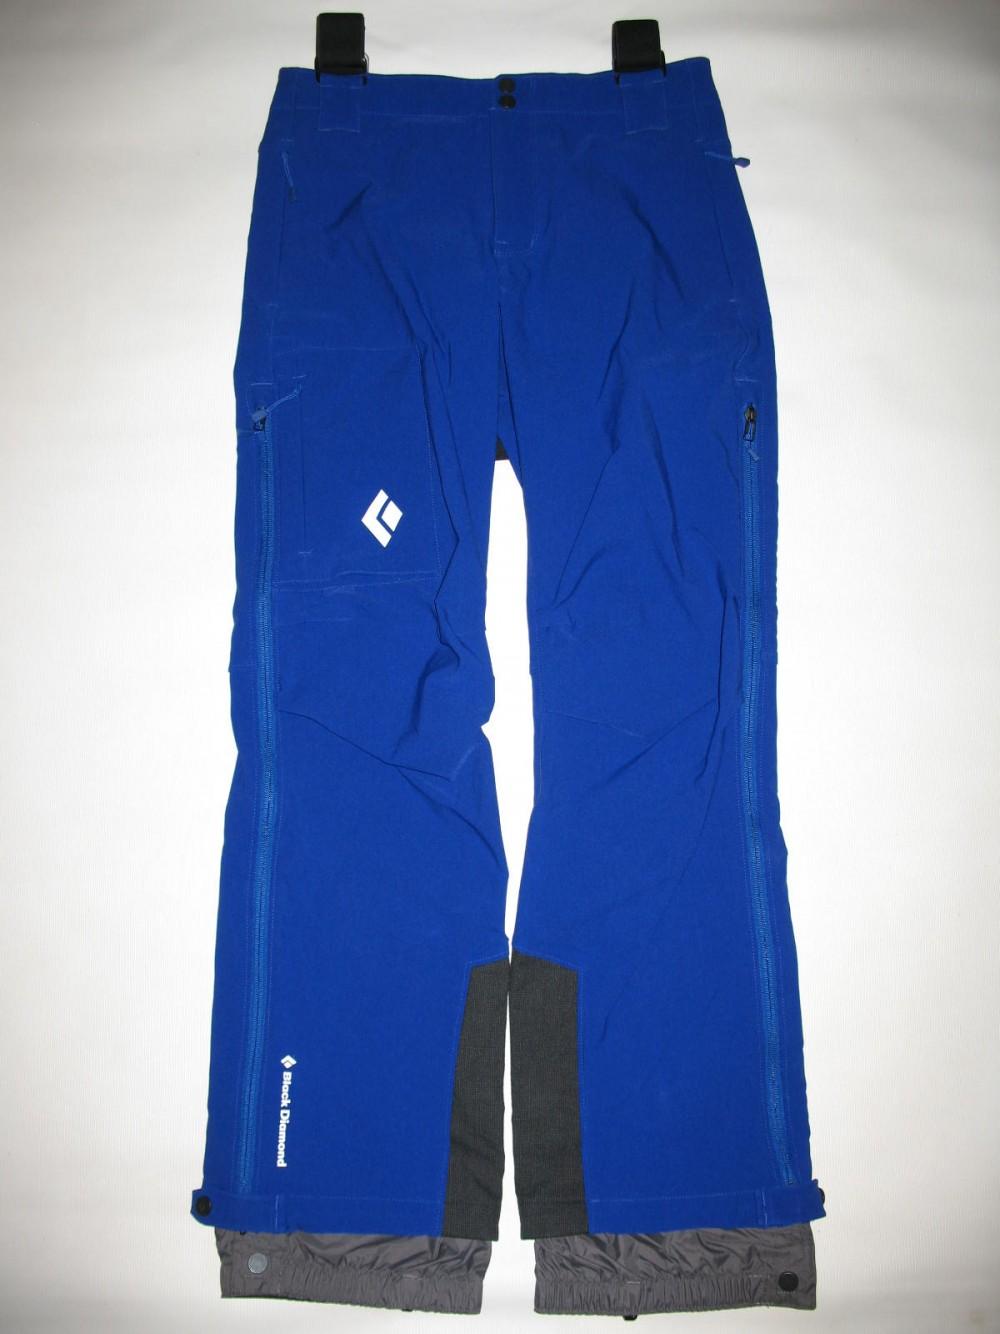 Штаны BLACK DIAMOND dawn patrol touring pants lady (размер S) - 1